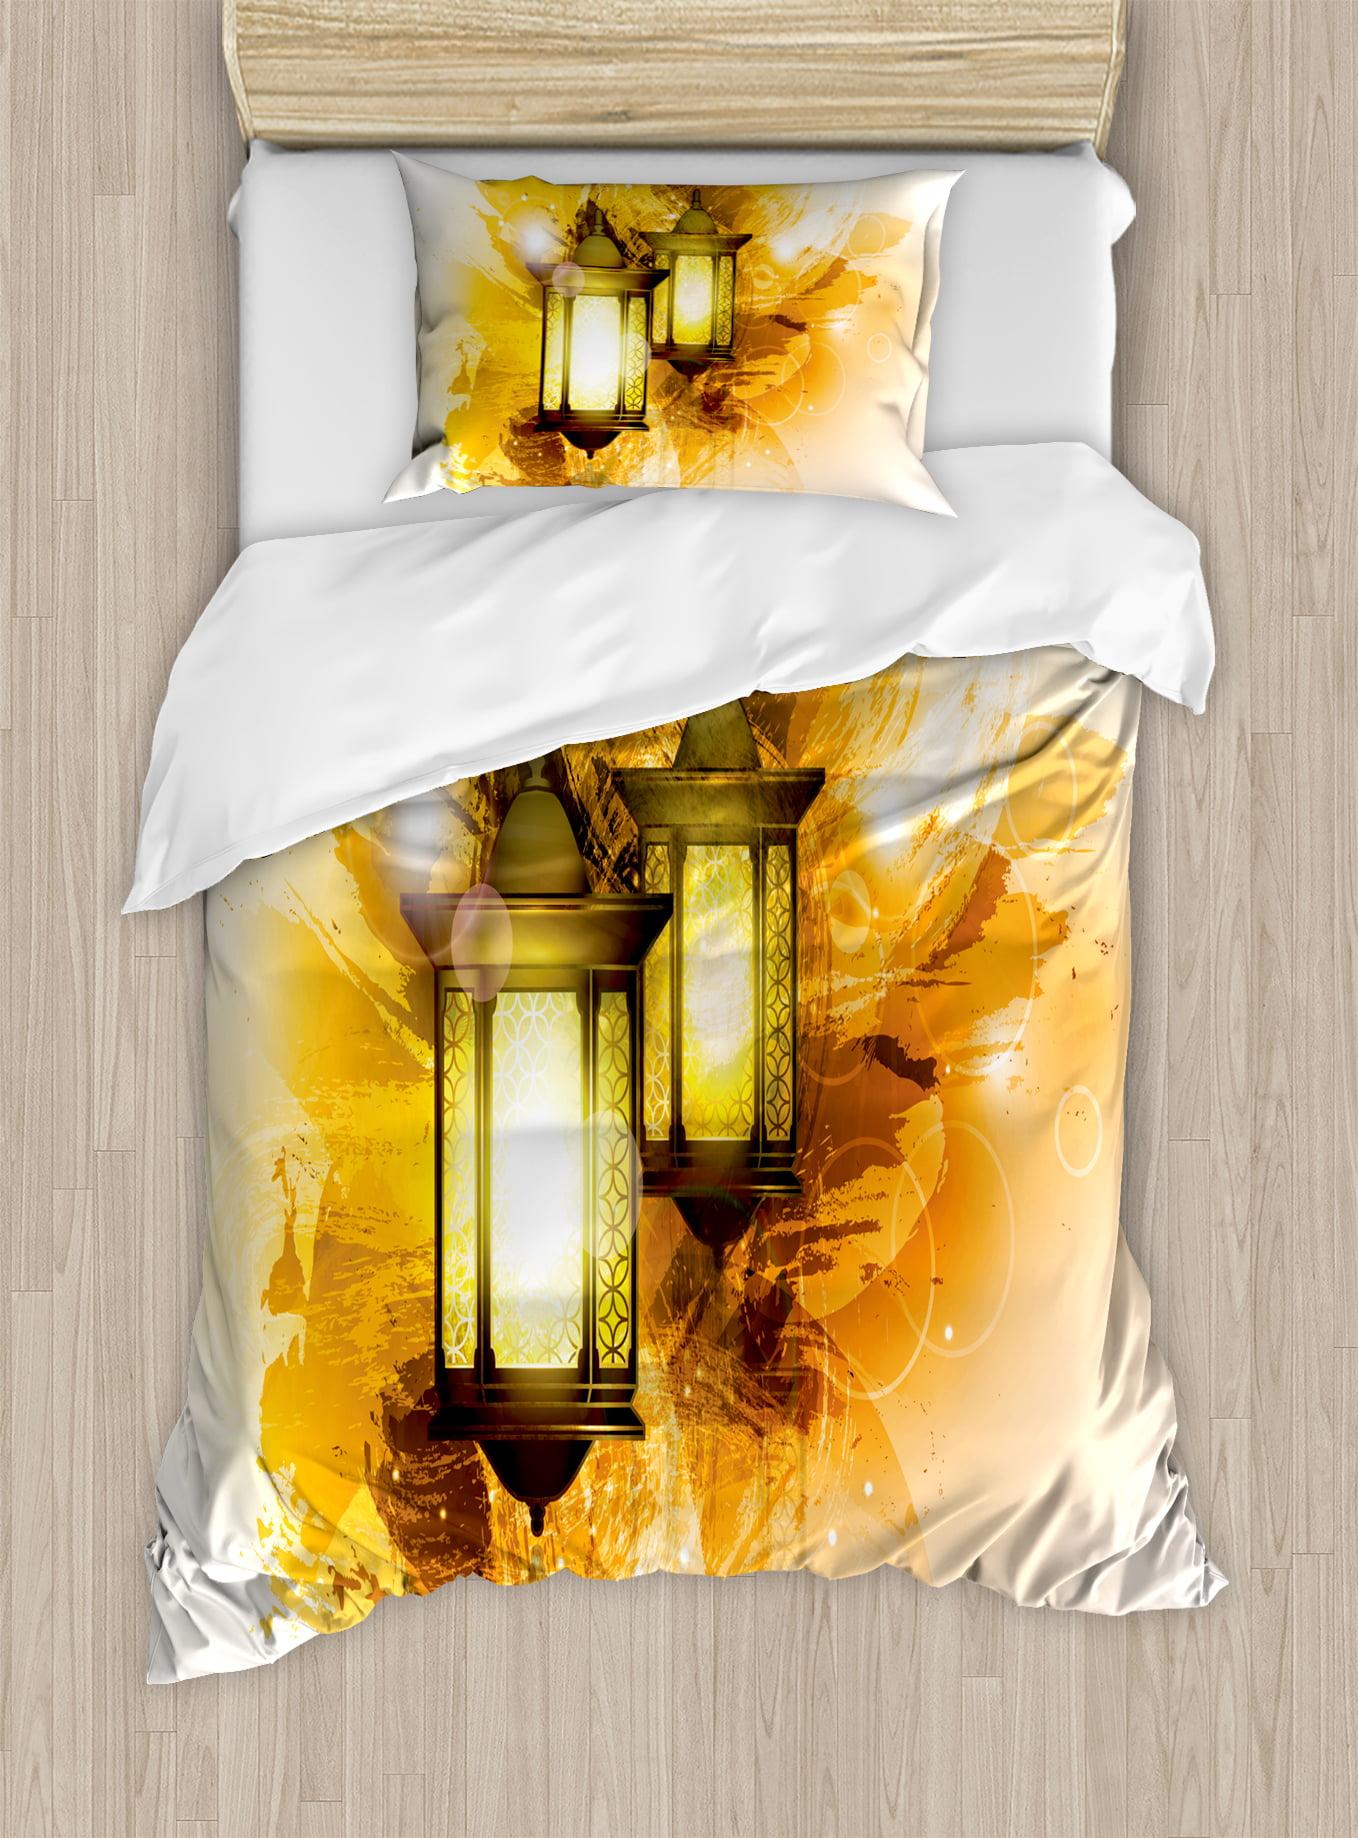 Arabesque Twin Size Duvet Cover Set, Urban Ramadan Kareem Lanterns Antique... by Kozmos